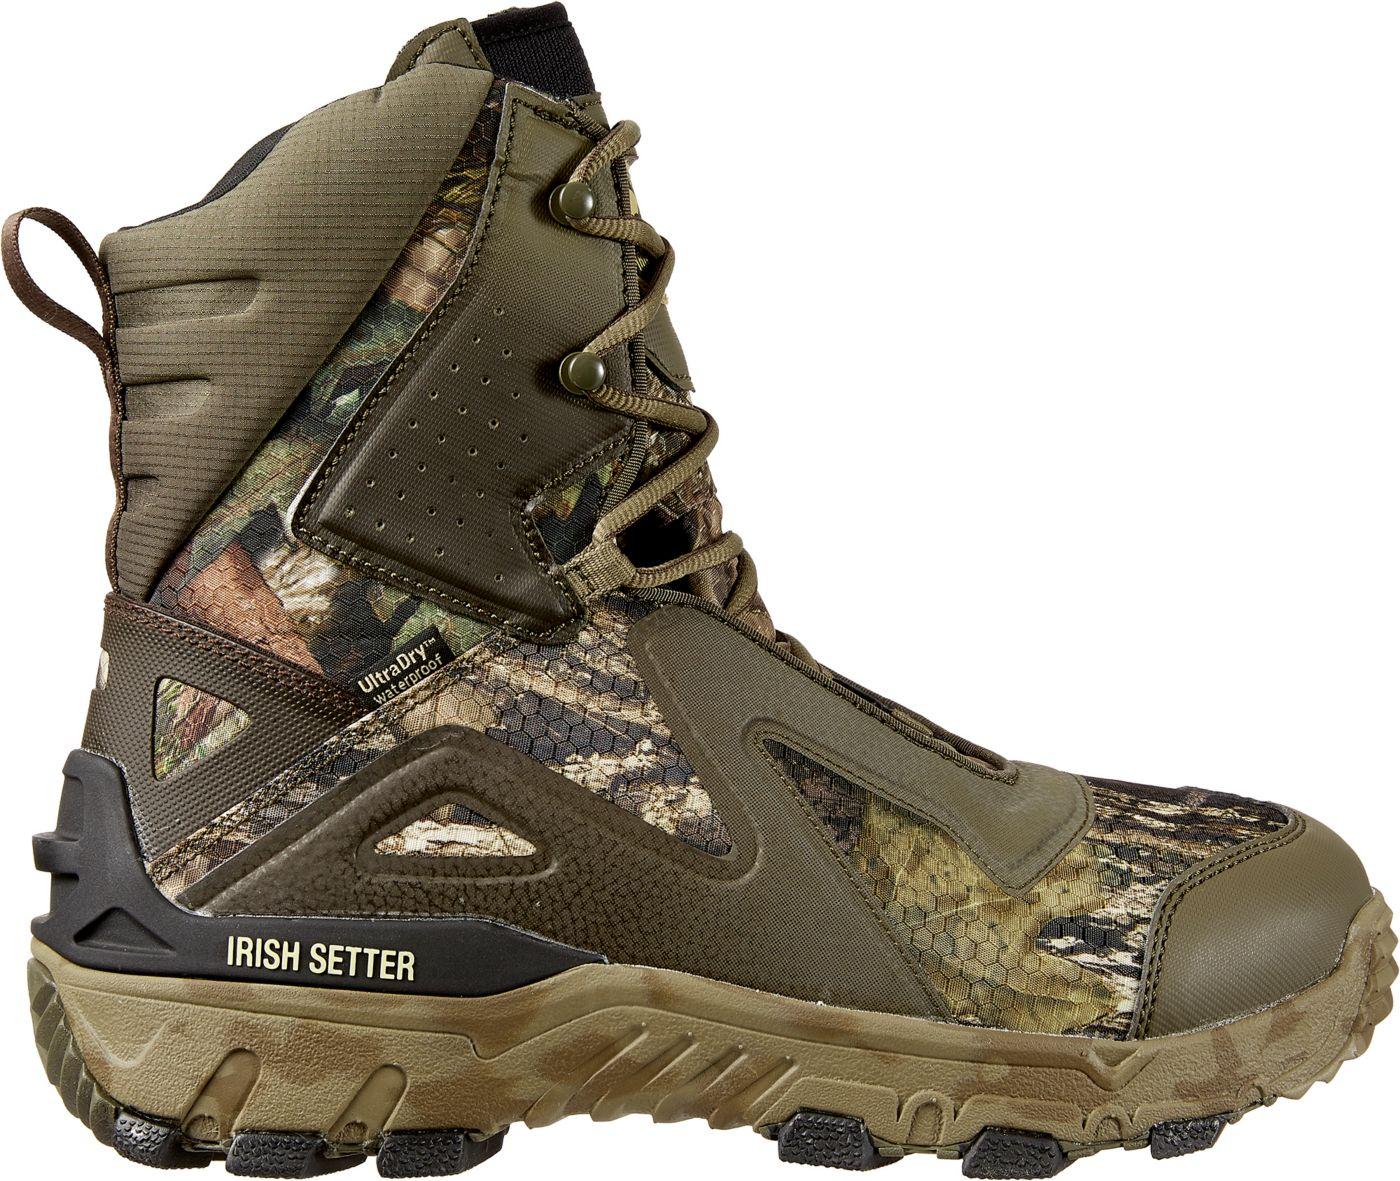 Irish Setter Men's VaprTrek LS 800g Realtree Xtra Waterproof Field Hunting Boots